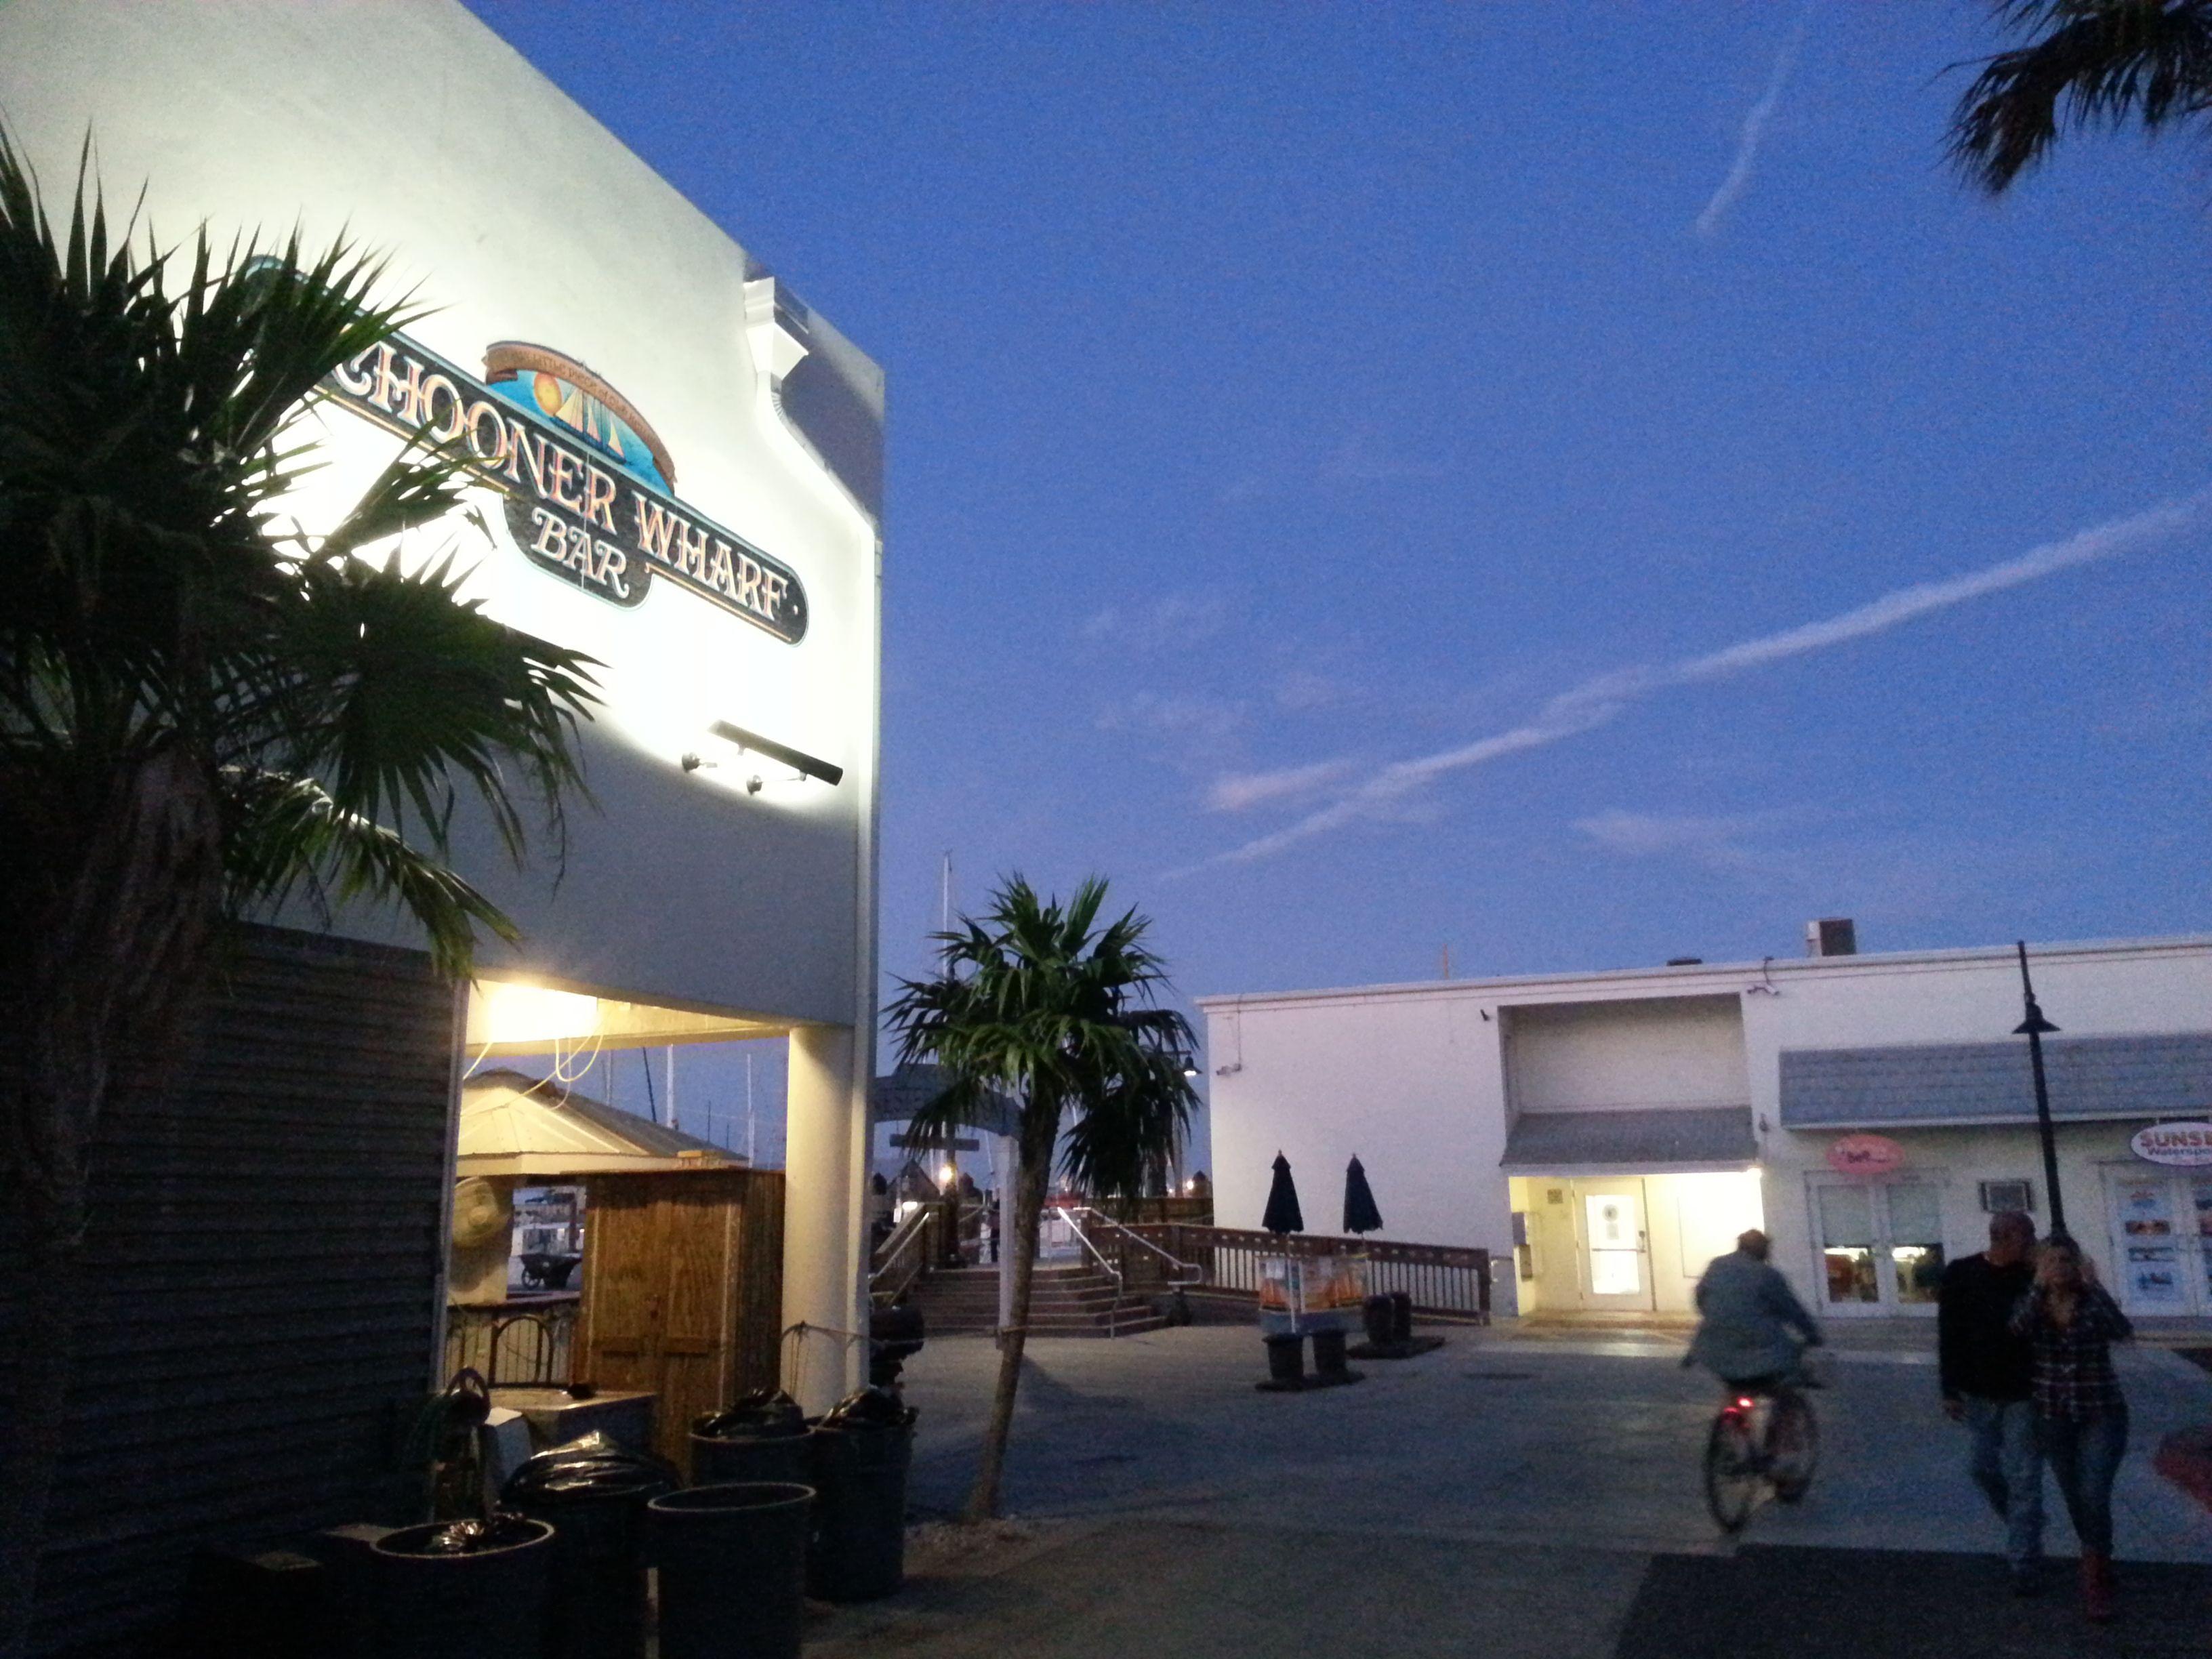 Schooner Wharf Bar in #KeyWest #Florida via Amplification, Inc. #socialmediamarketing and #videoproduction http://amplificationinc.com/